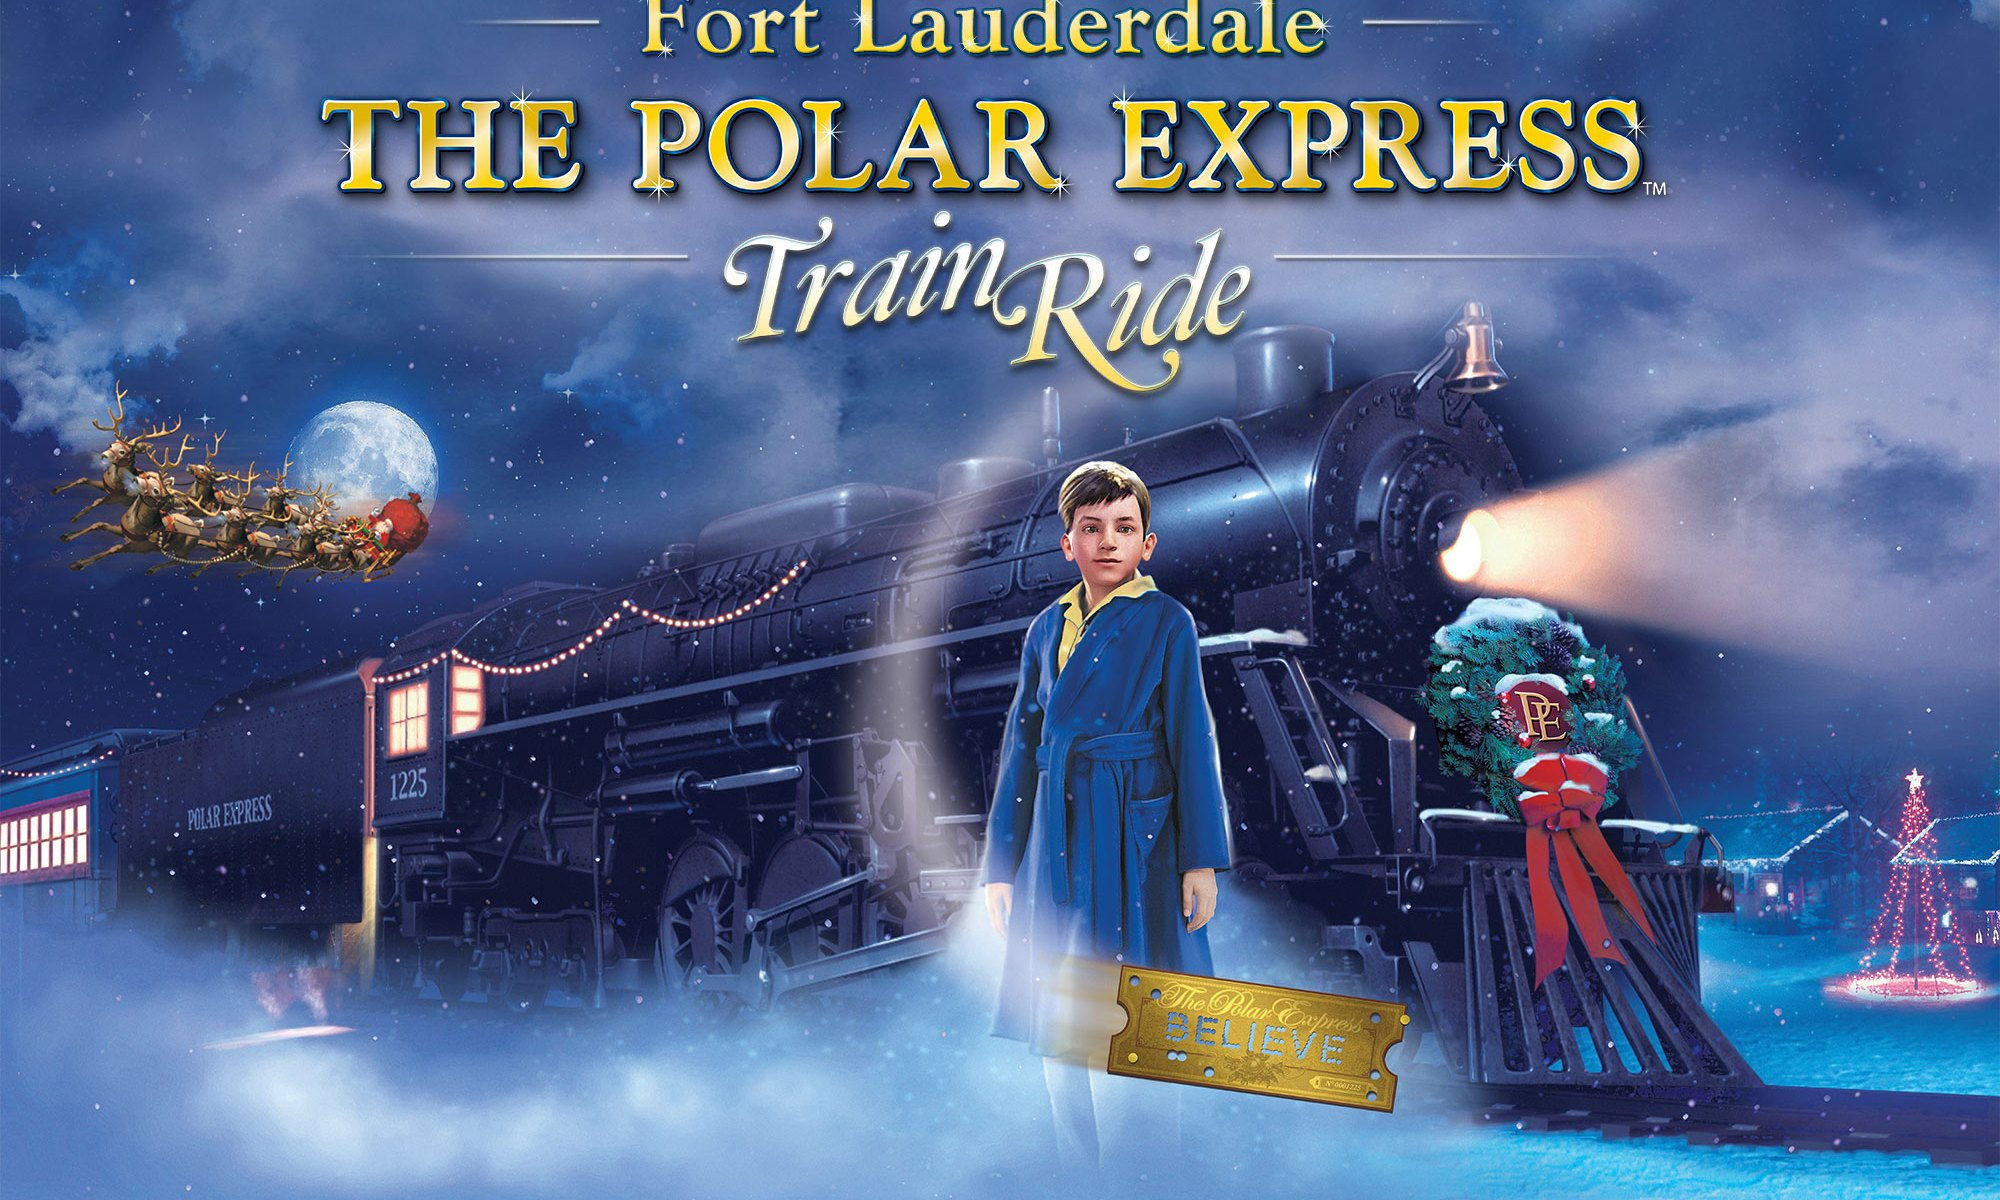 2020 Christmas Specials Featuring Josh Groban Movie Music Monday, Believe from The Polar Express, Josh Groban